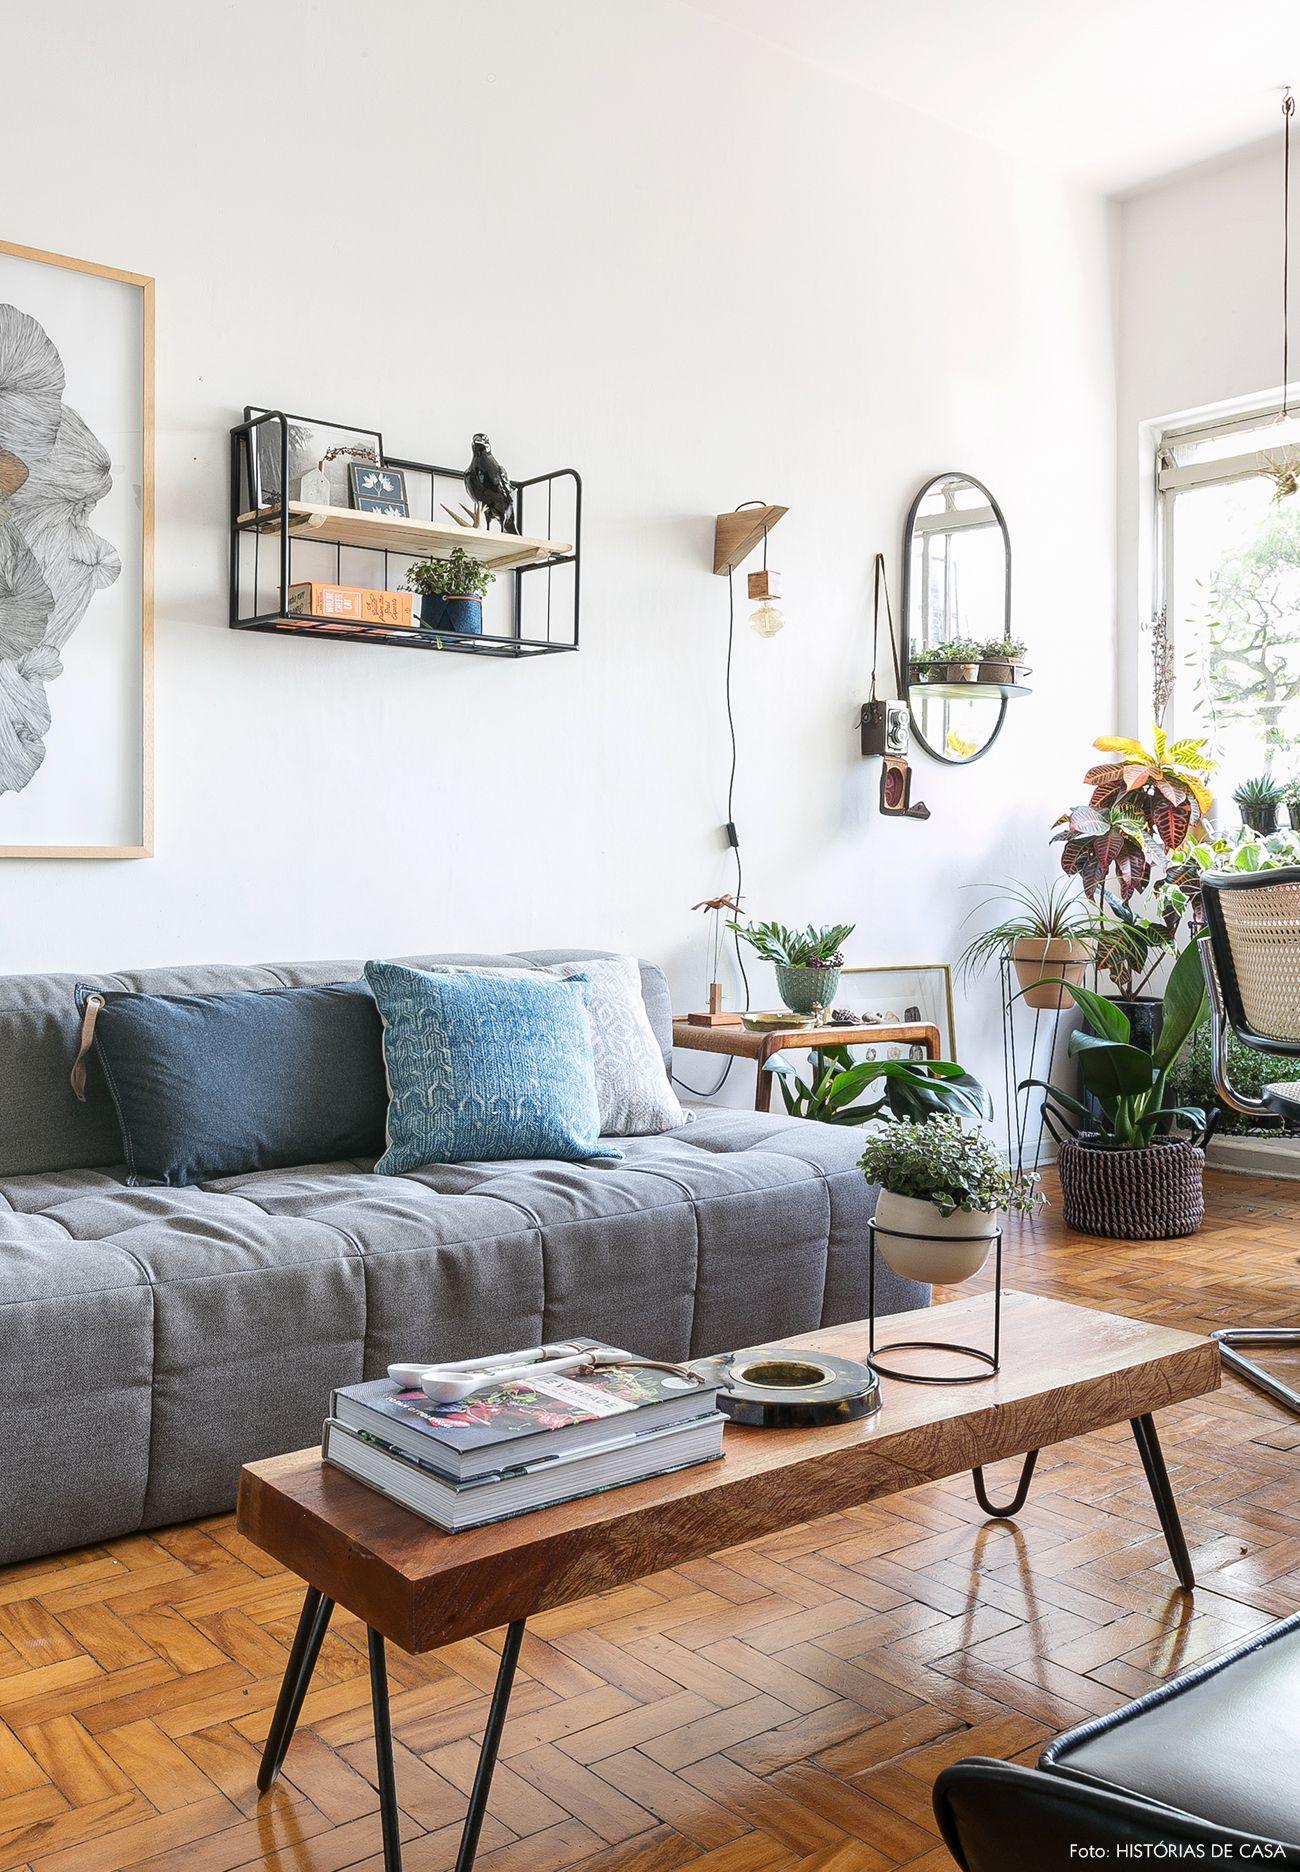 Nos mnimos detalhes house Pinterest